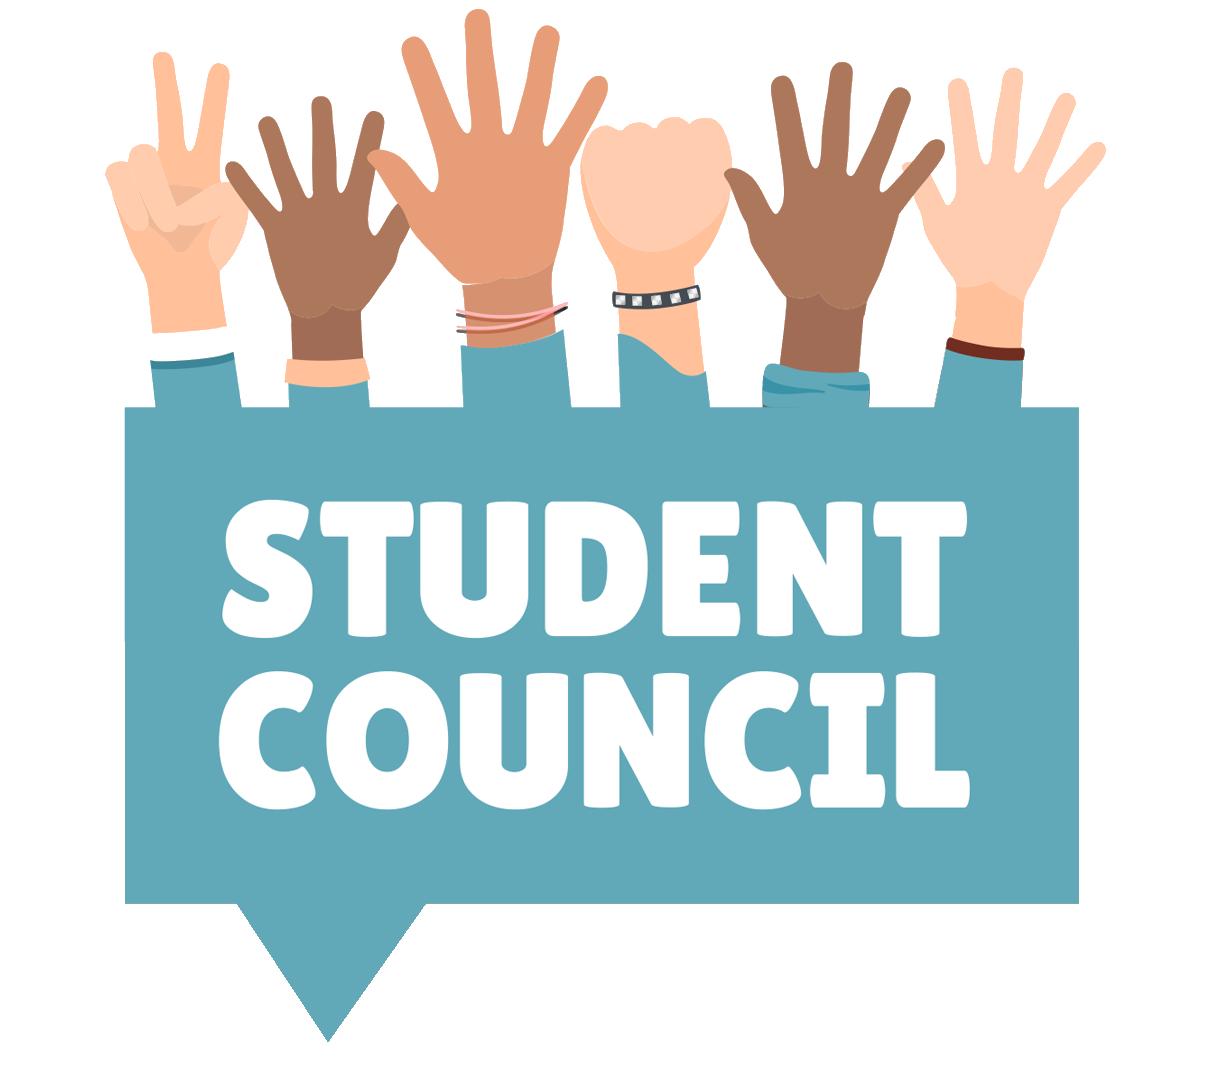 StudentCouncil.23.png